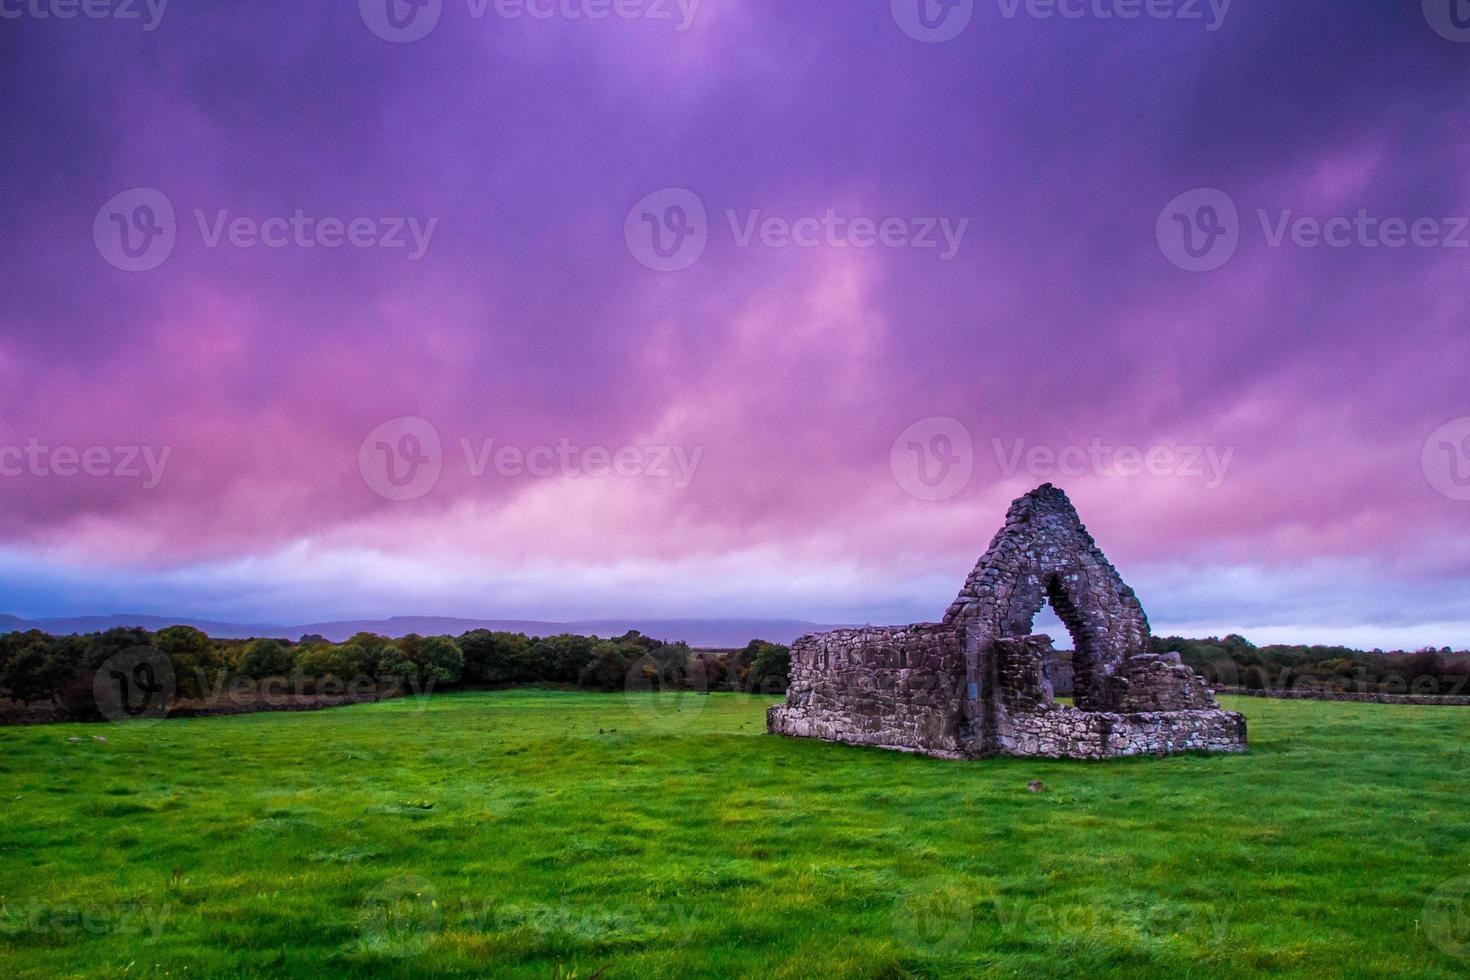 tempesta sulle rovine irlandesi foto